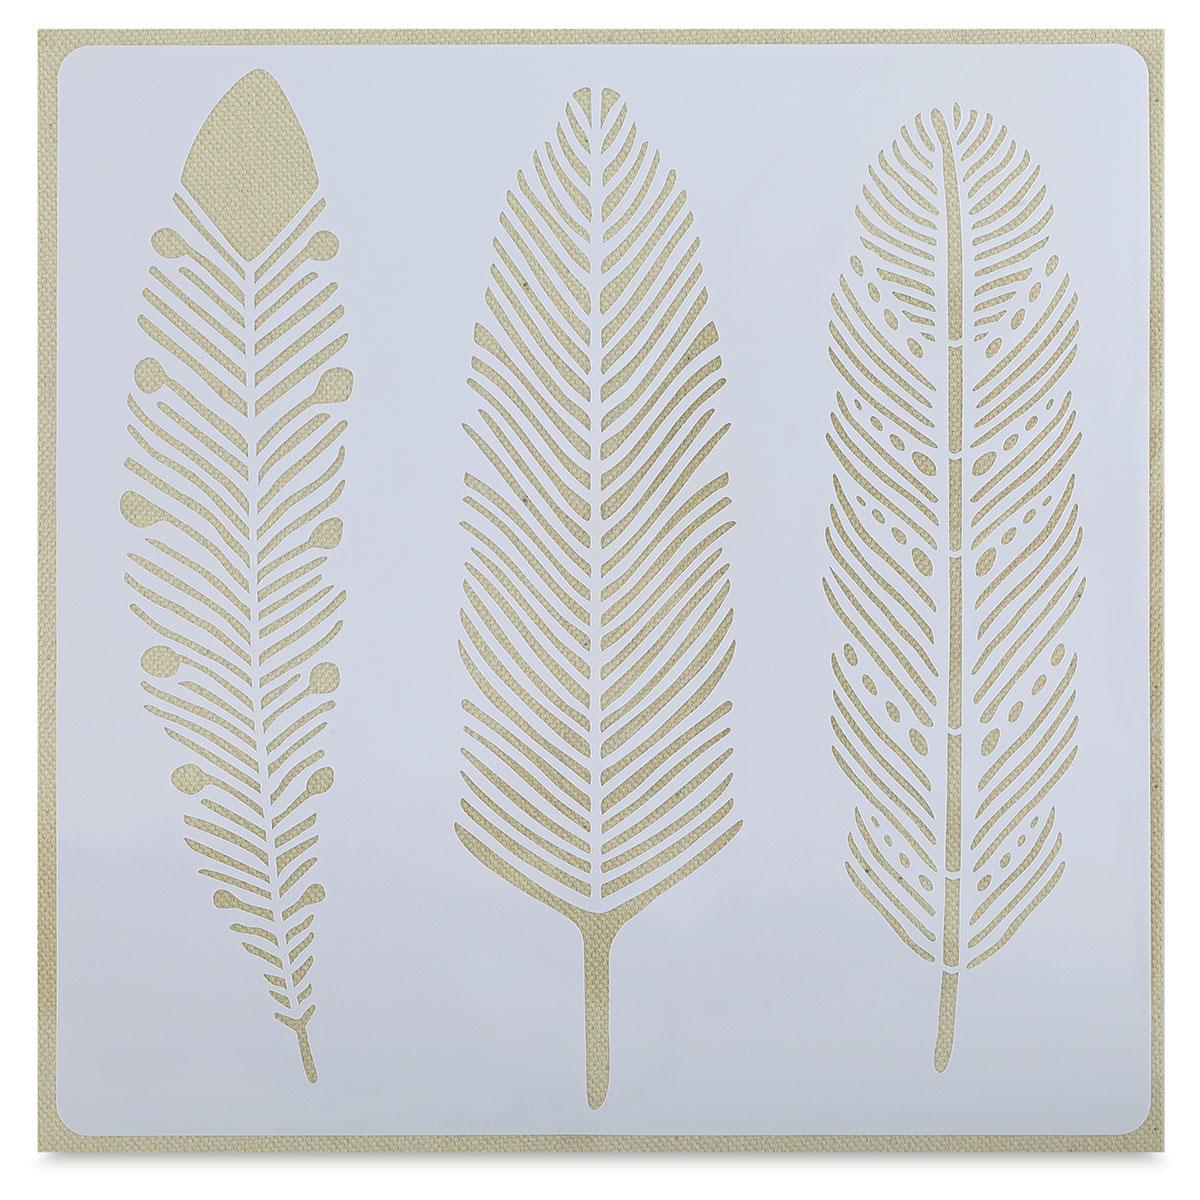 Momenta 3 Feathers Adhesive Fabric Stencil